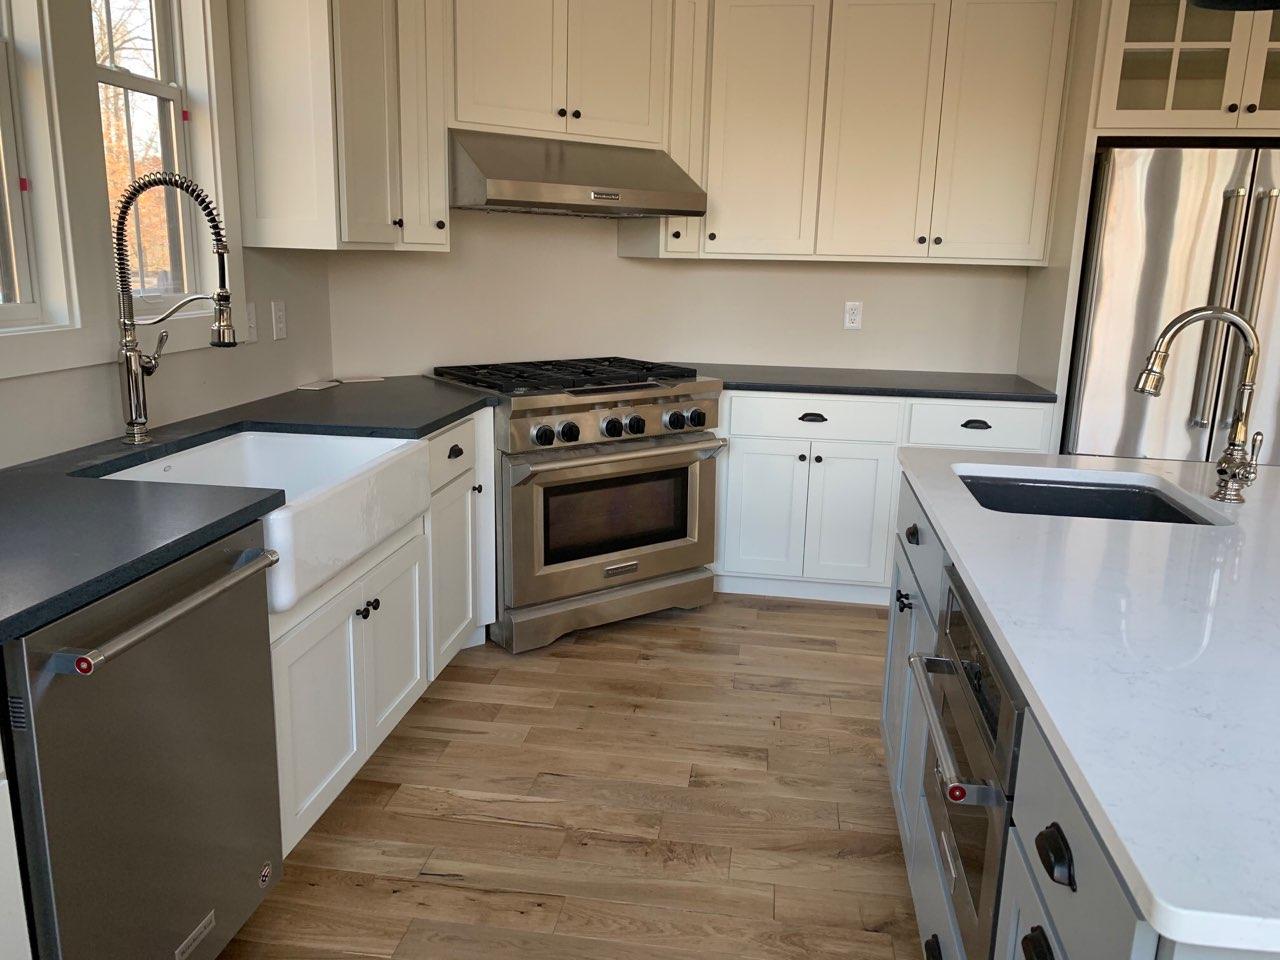 bounds-flooring-kitchen-backsplash1